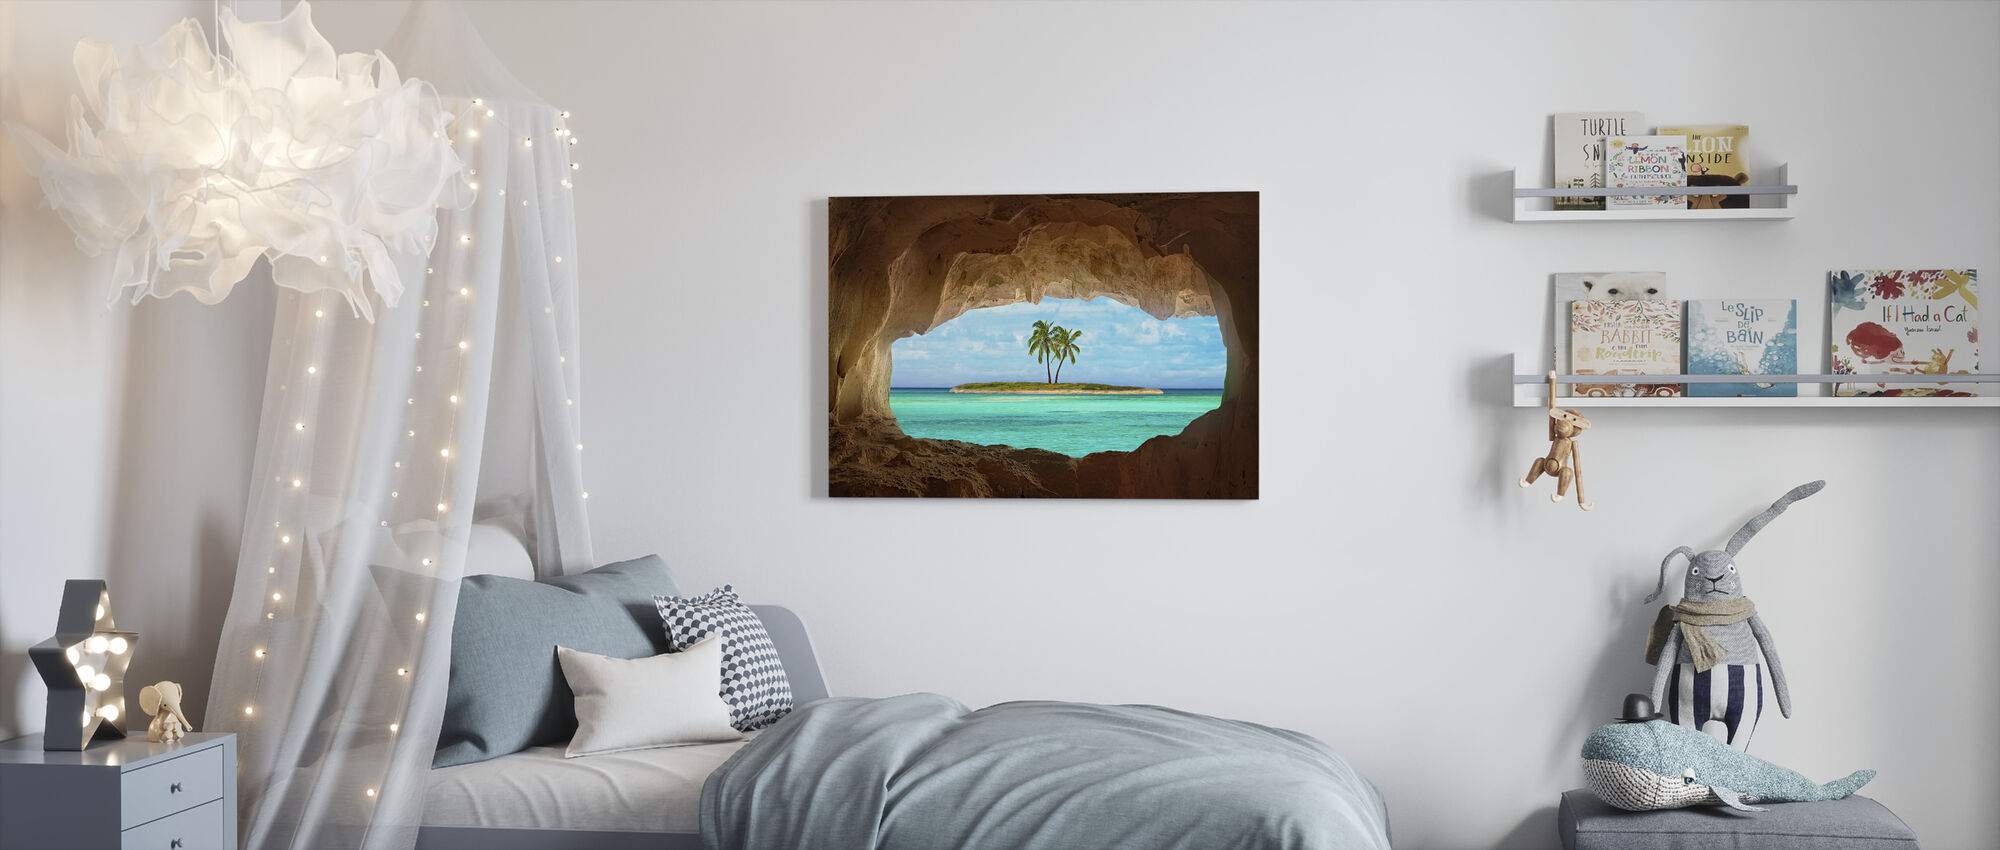 Paradise through Window - Canvas print - Kids Room